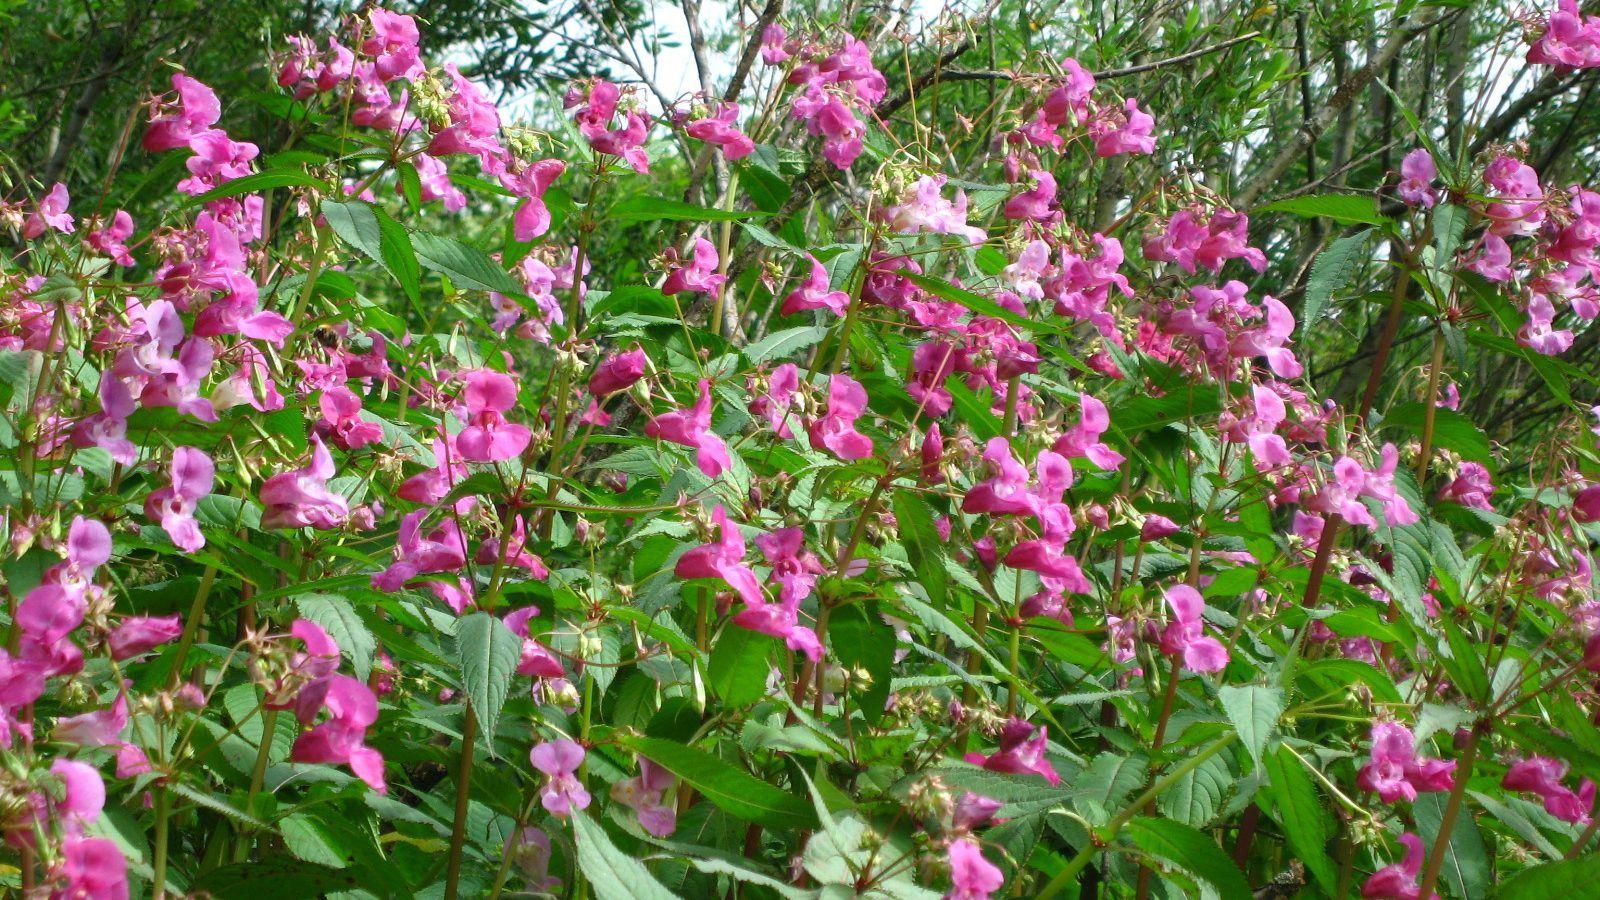 Himalayan balsam flowers